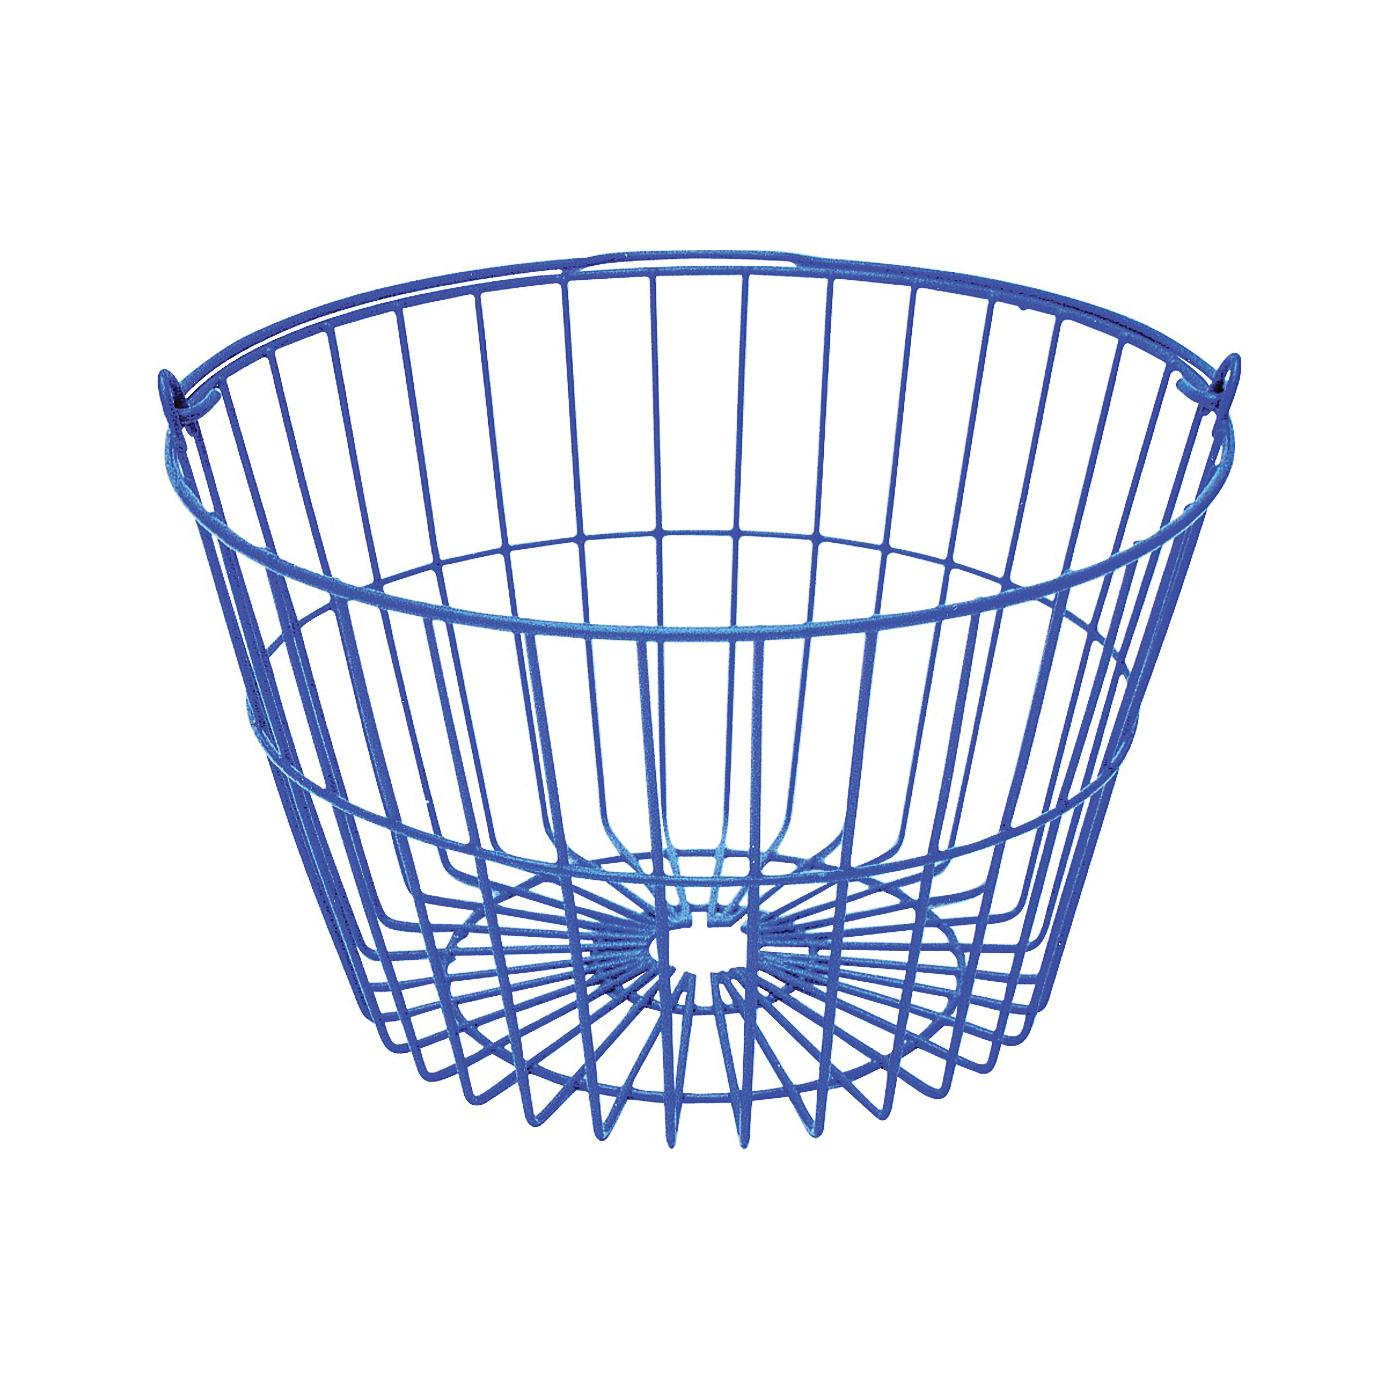 Picture of FORTEX-FORTIFLEX 215 Egg Basket, 15 Dozen Capacity, Vinyl